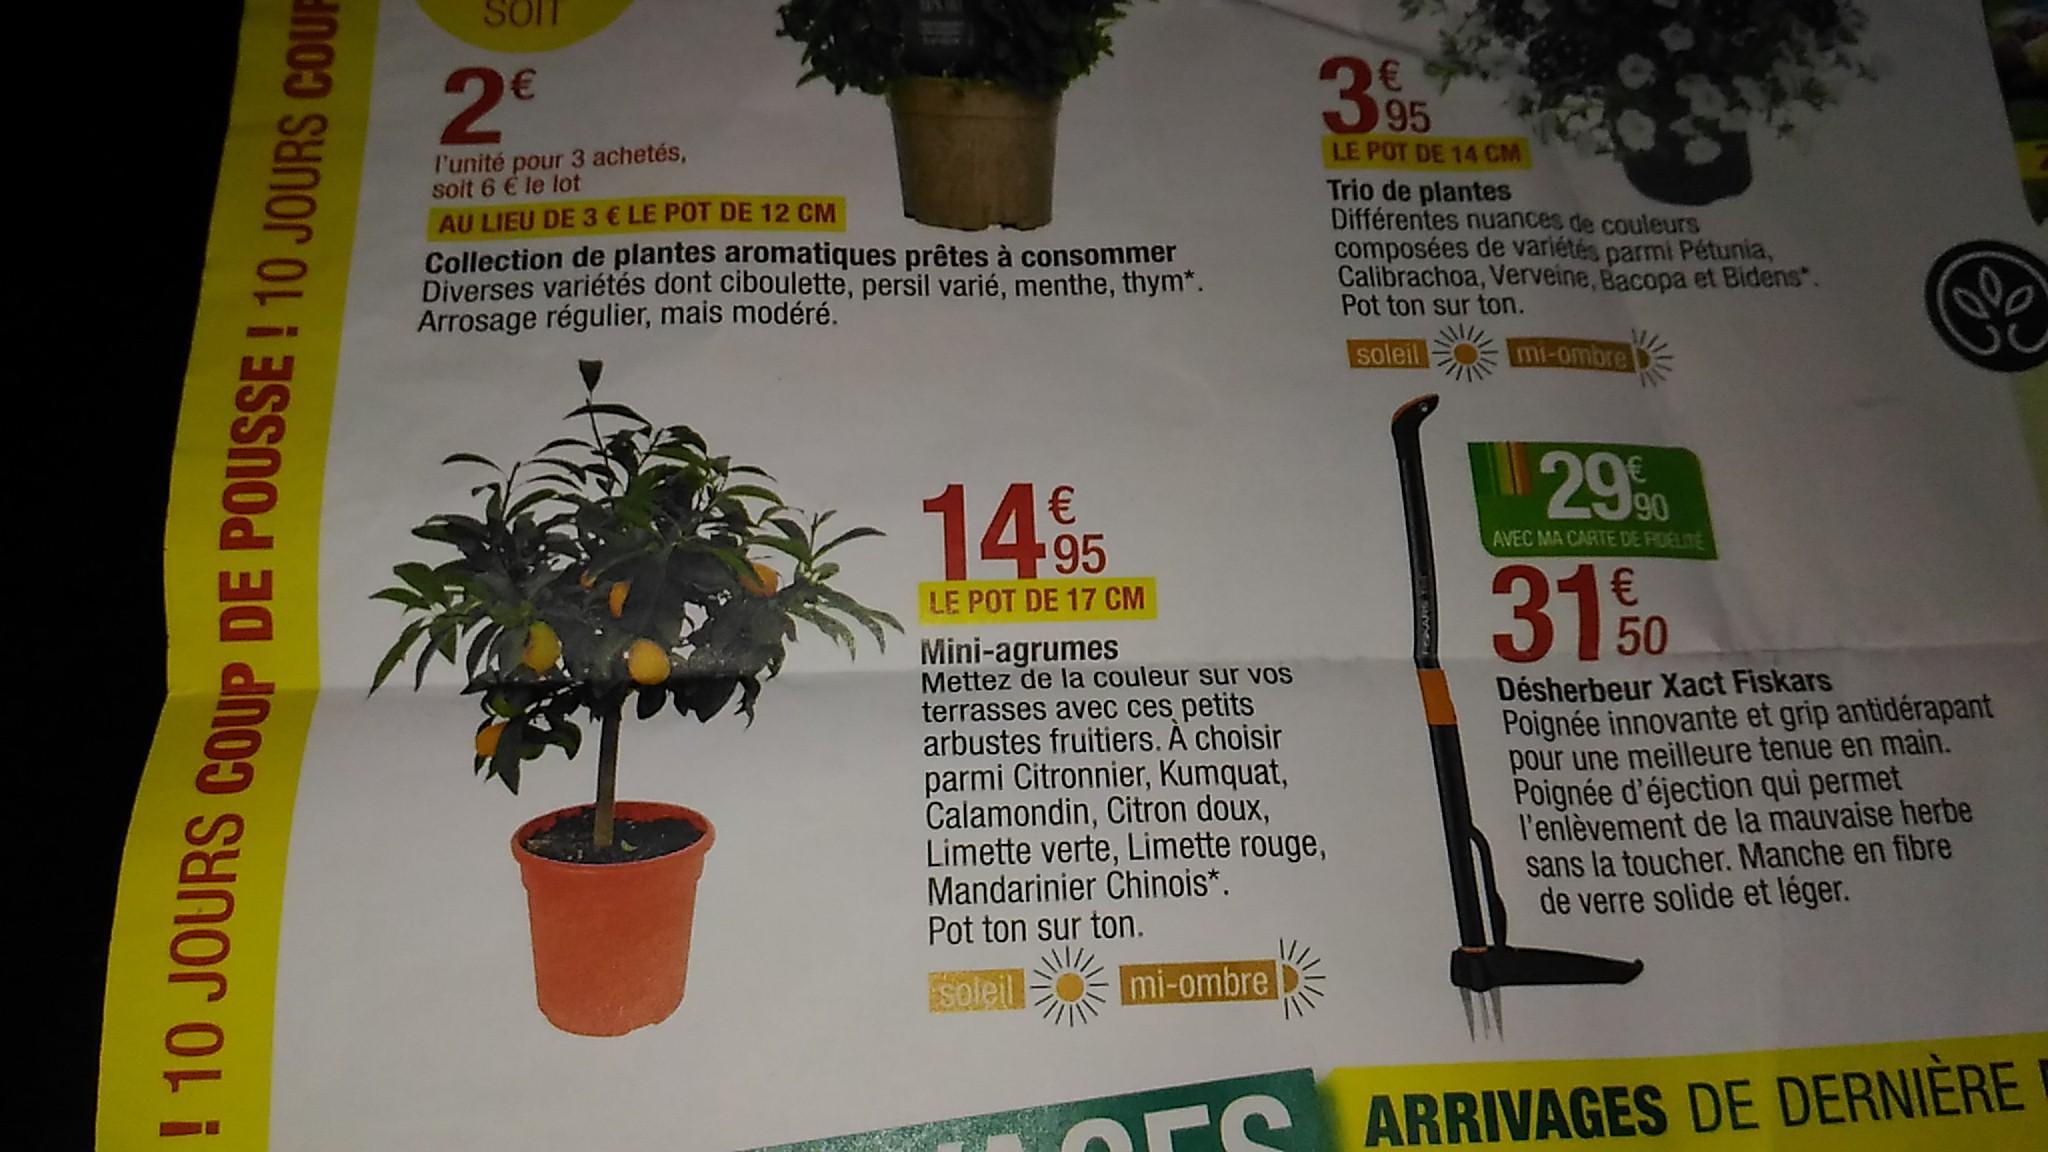 Mini-agrumes - Pot de 17 cm (Citronnier, Oranger, Limette, Mandarinier, ...)